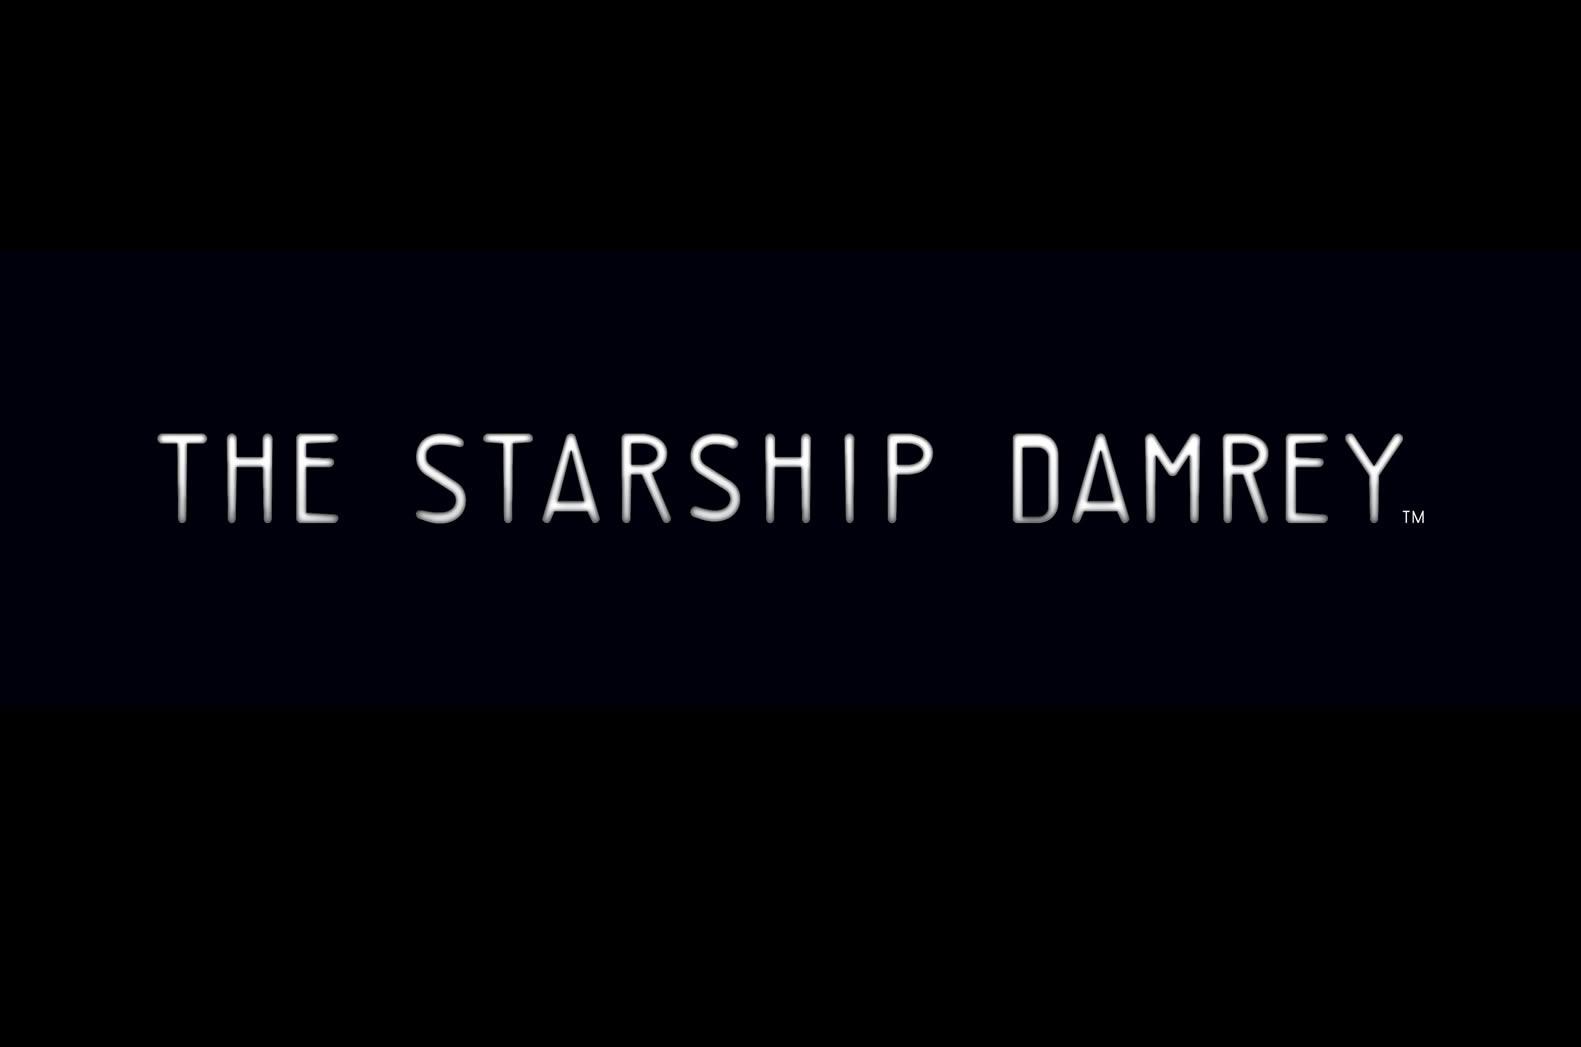 PN Review: The Starship Damrey (3DS eShop)